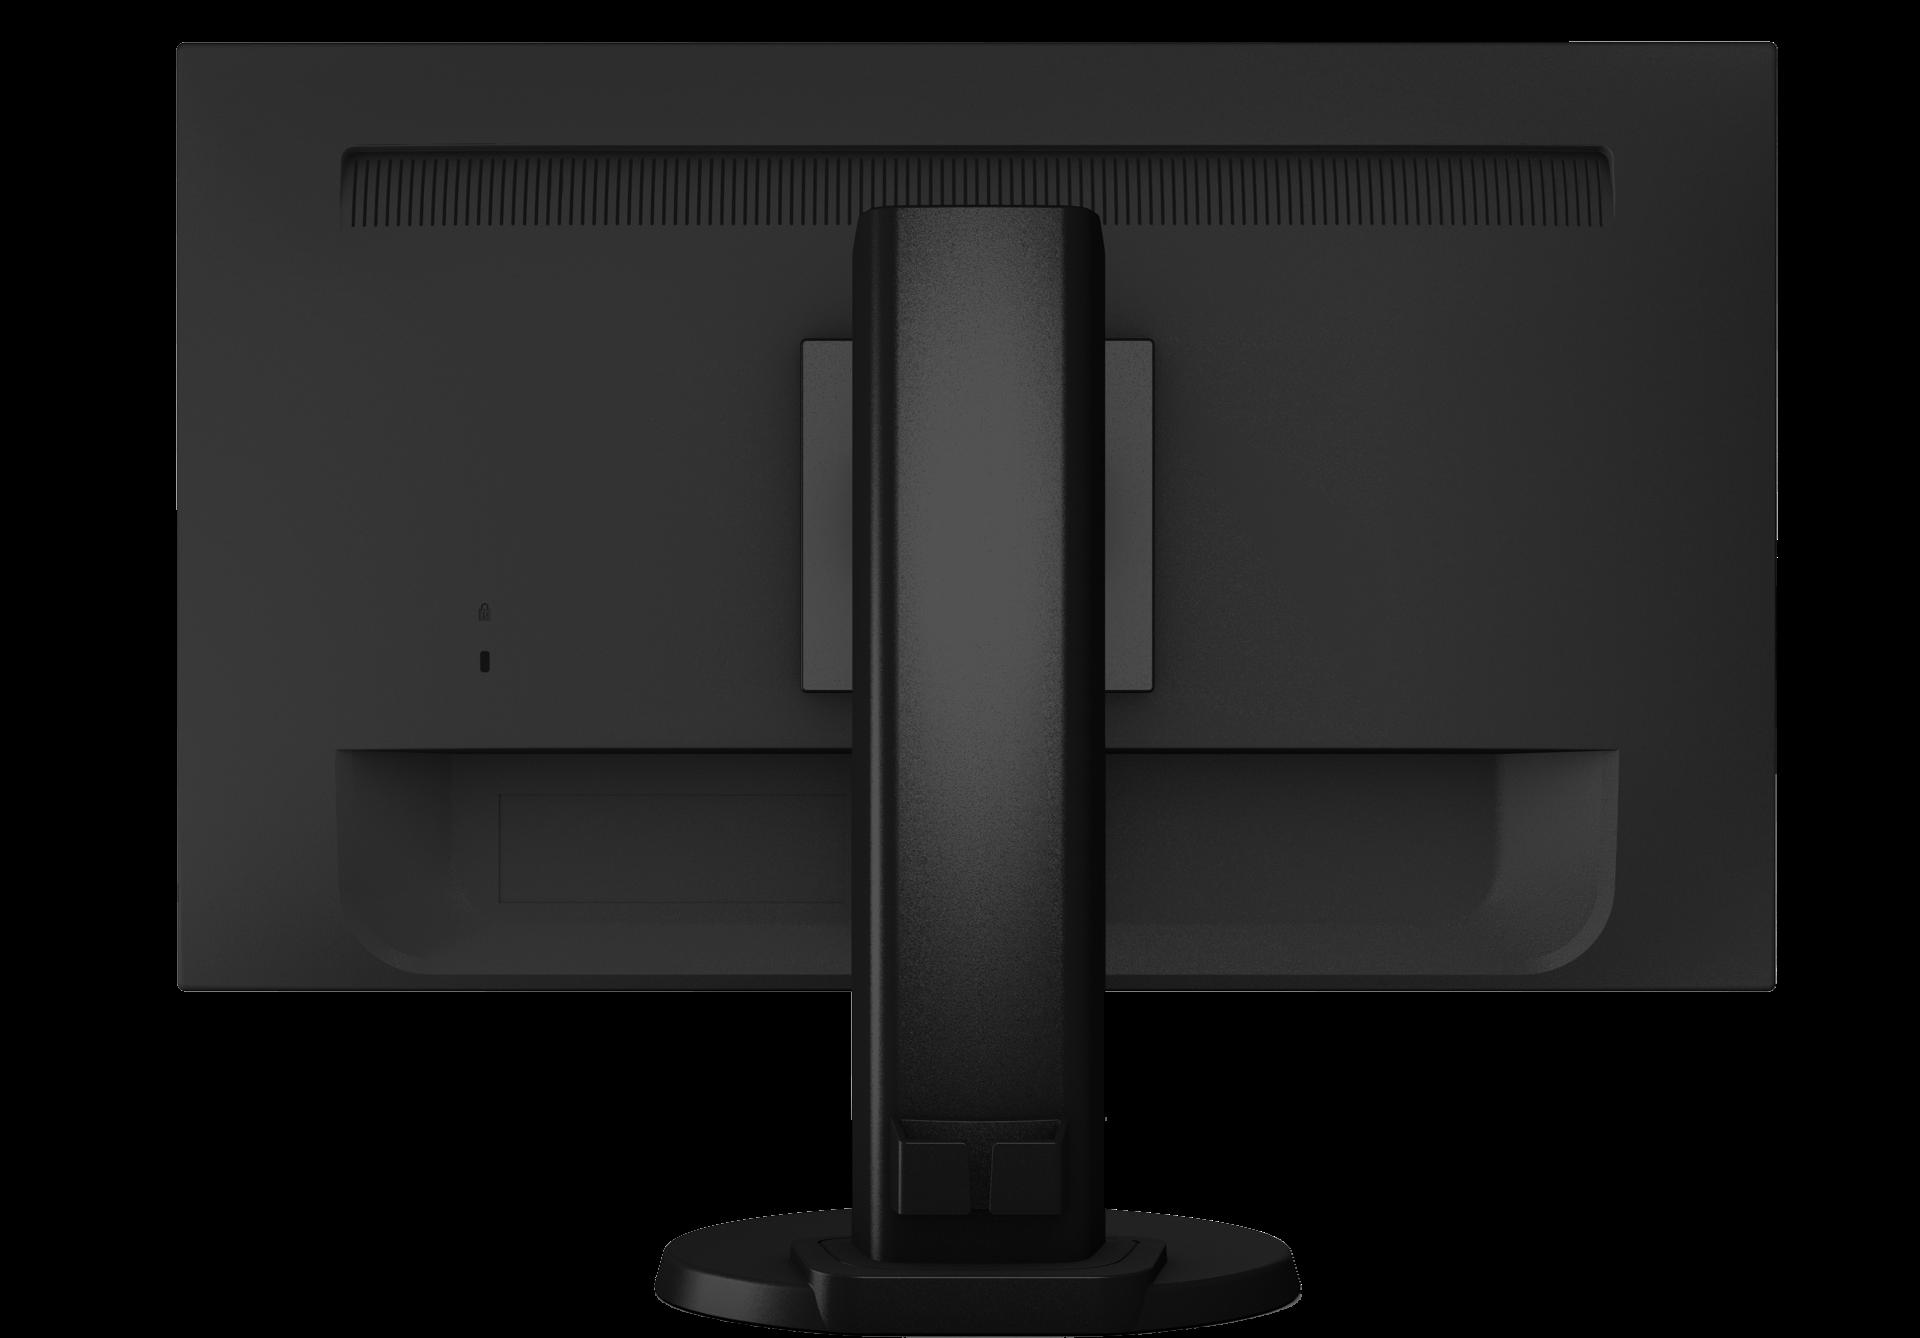 Pxl2471mw 24 Quot Lcd Monitor Planar